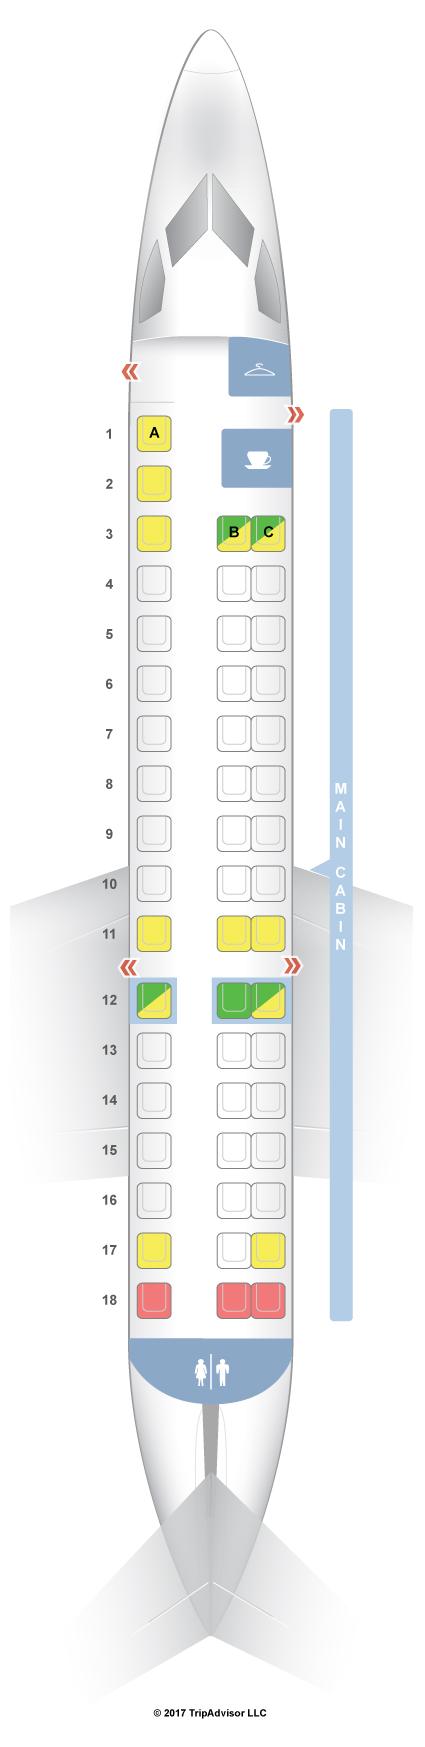 SeatGuru Seat Map American Airlines Embraer ERJ145 ER4 - Us Airways A321 Seat Map